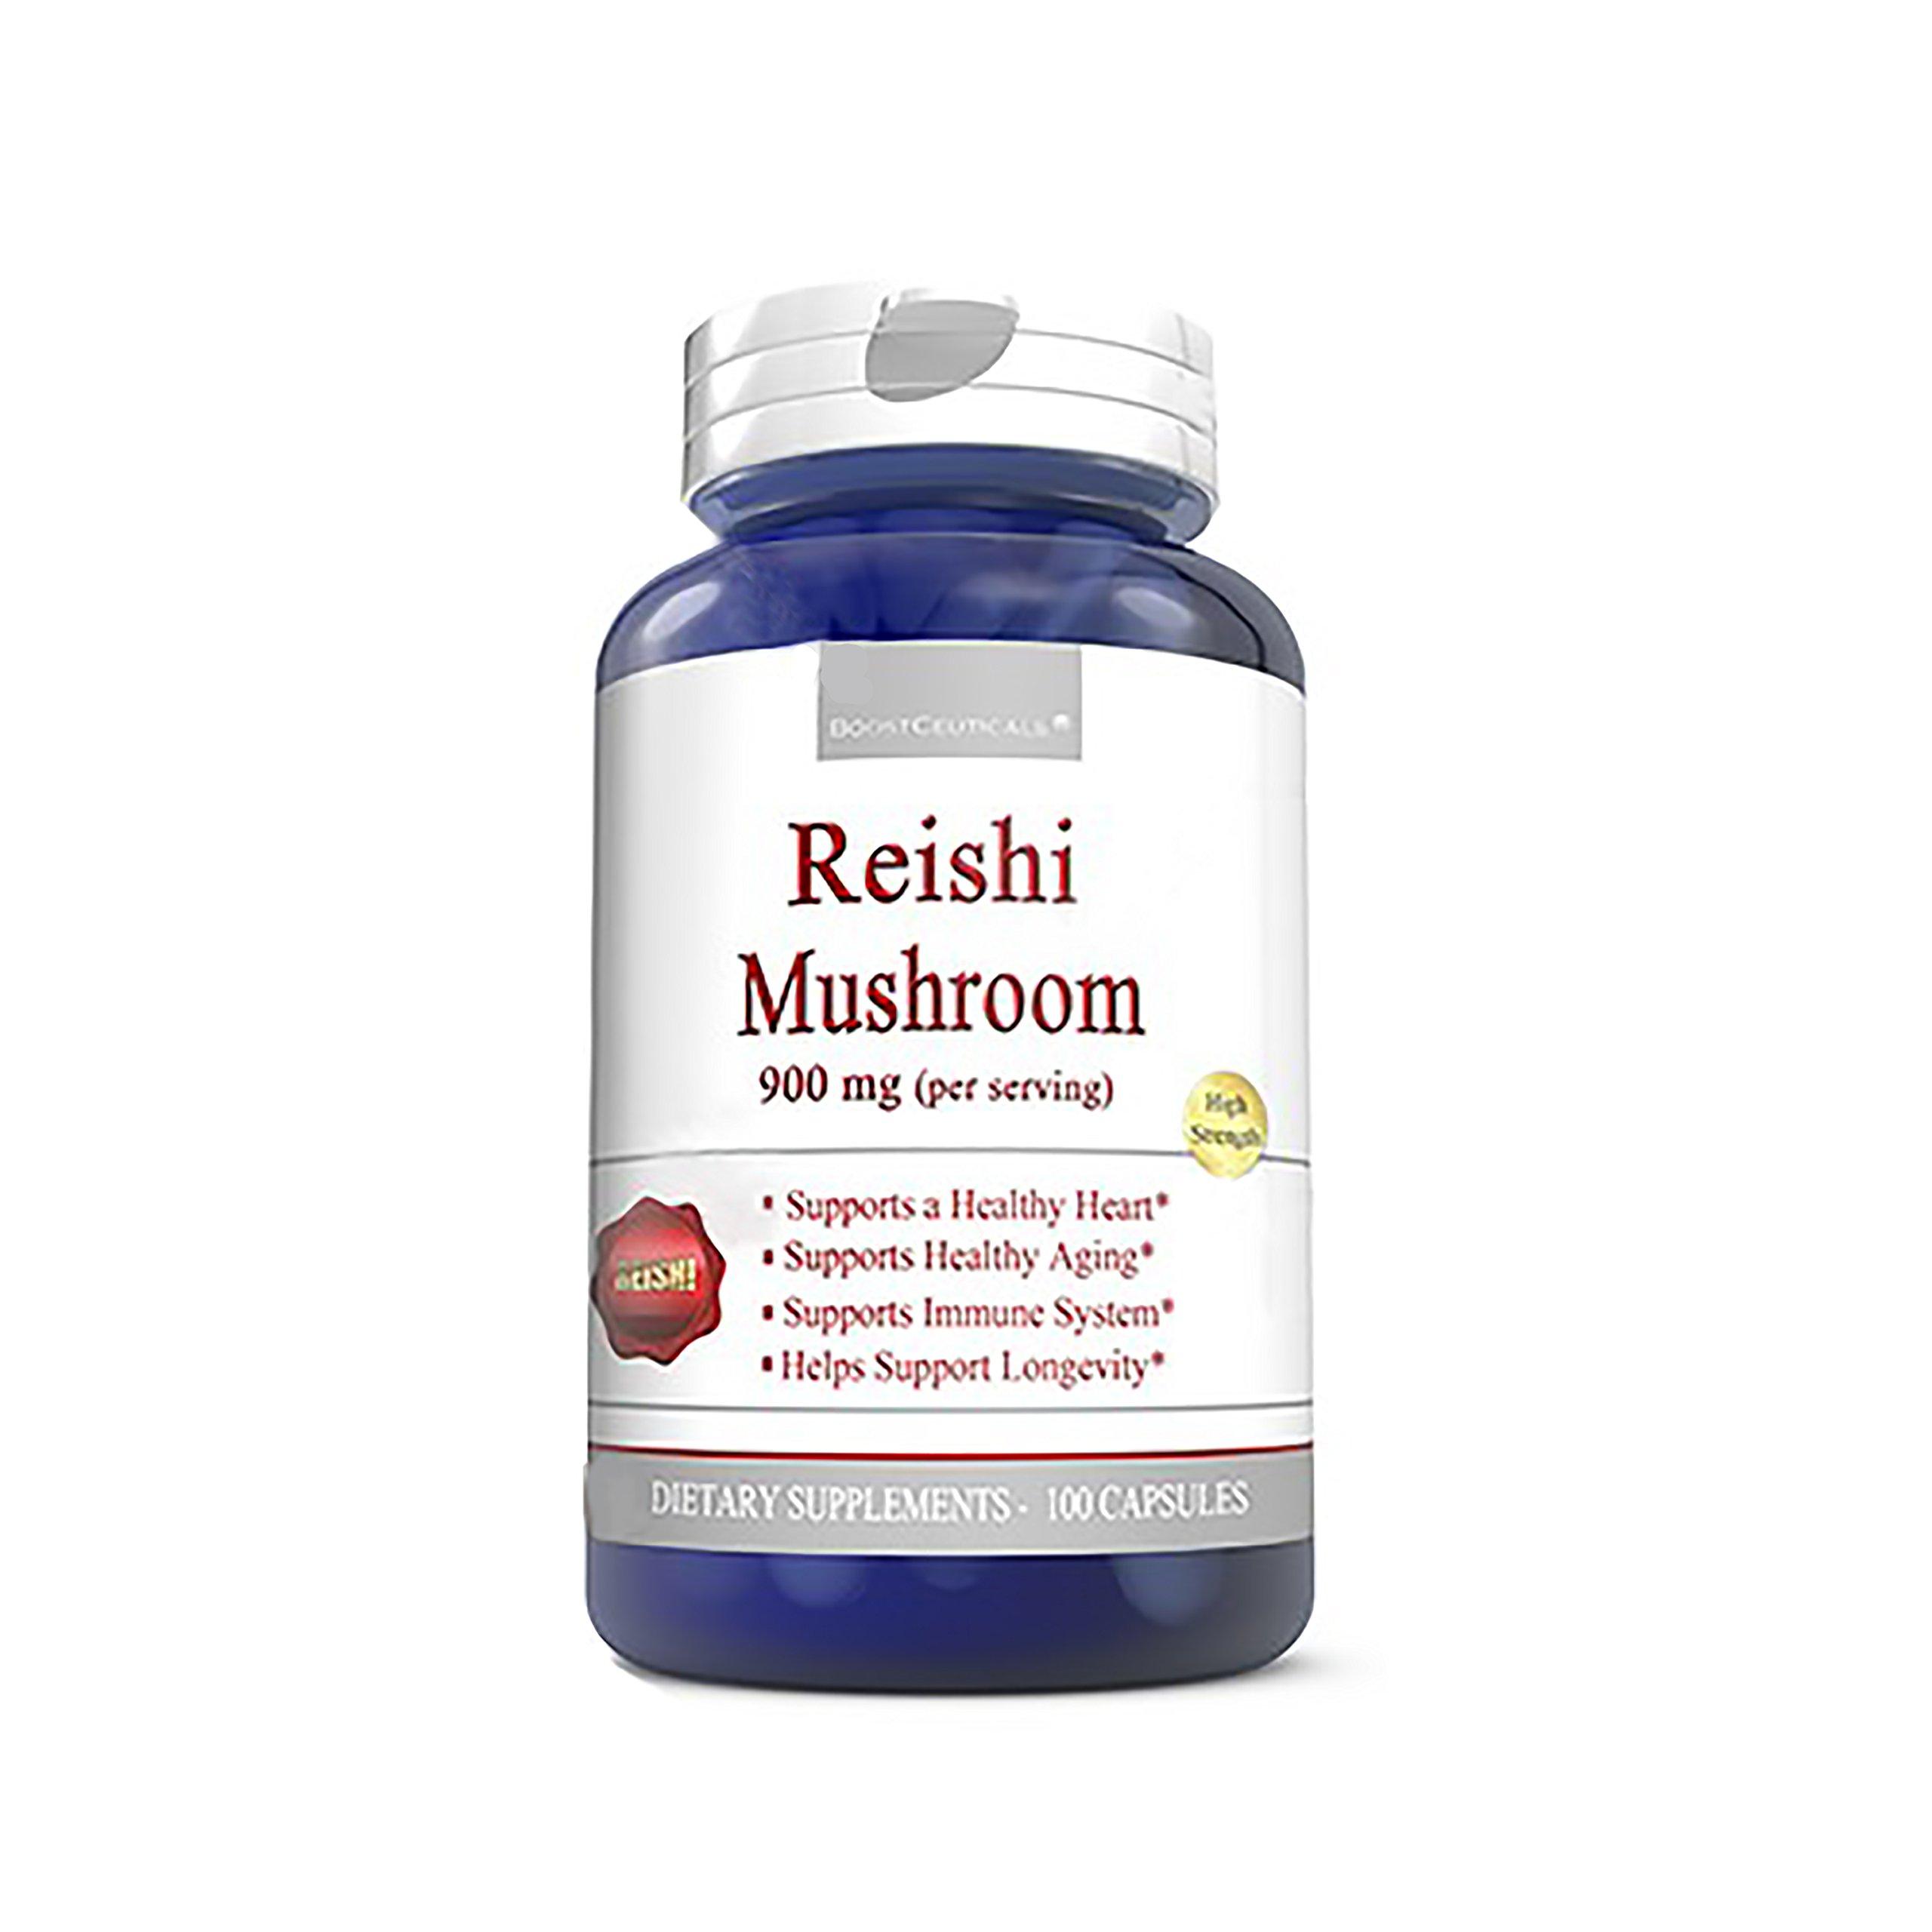 Reishi 900mg 100 Mushroom Supplement Capsules - Immune System Booster Reishi Mushroom by BoostCeuticals